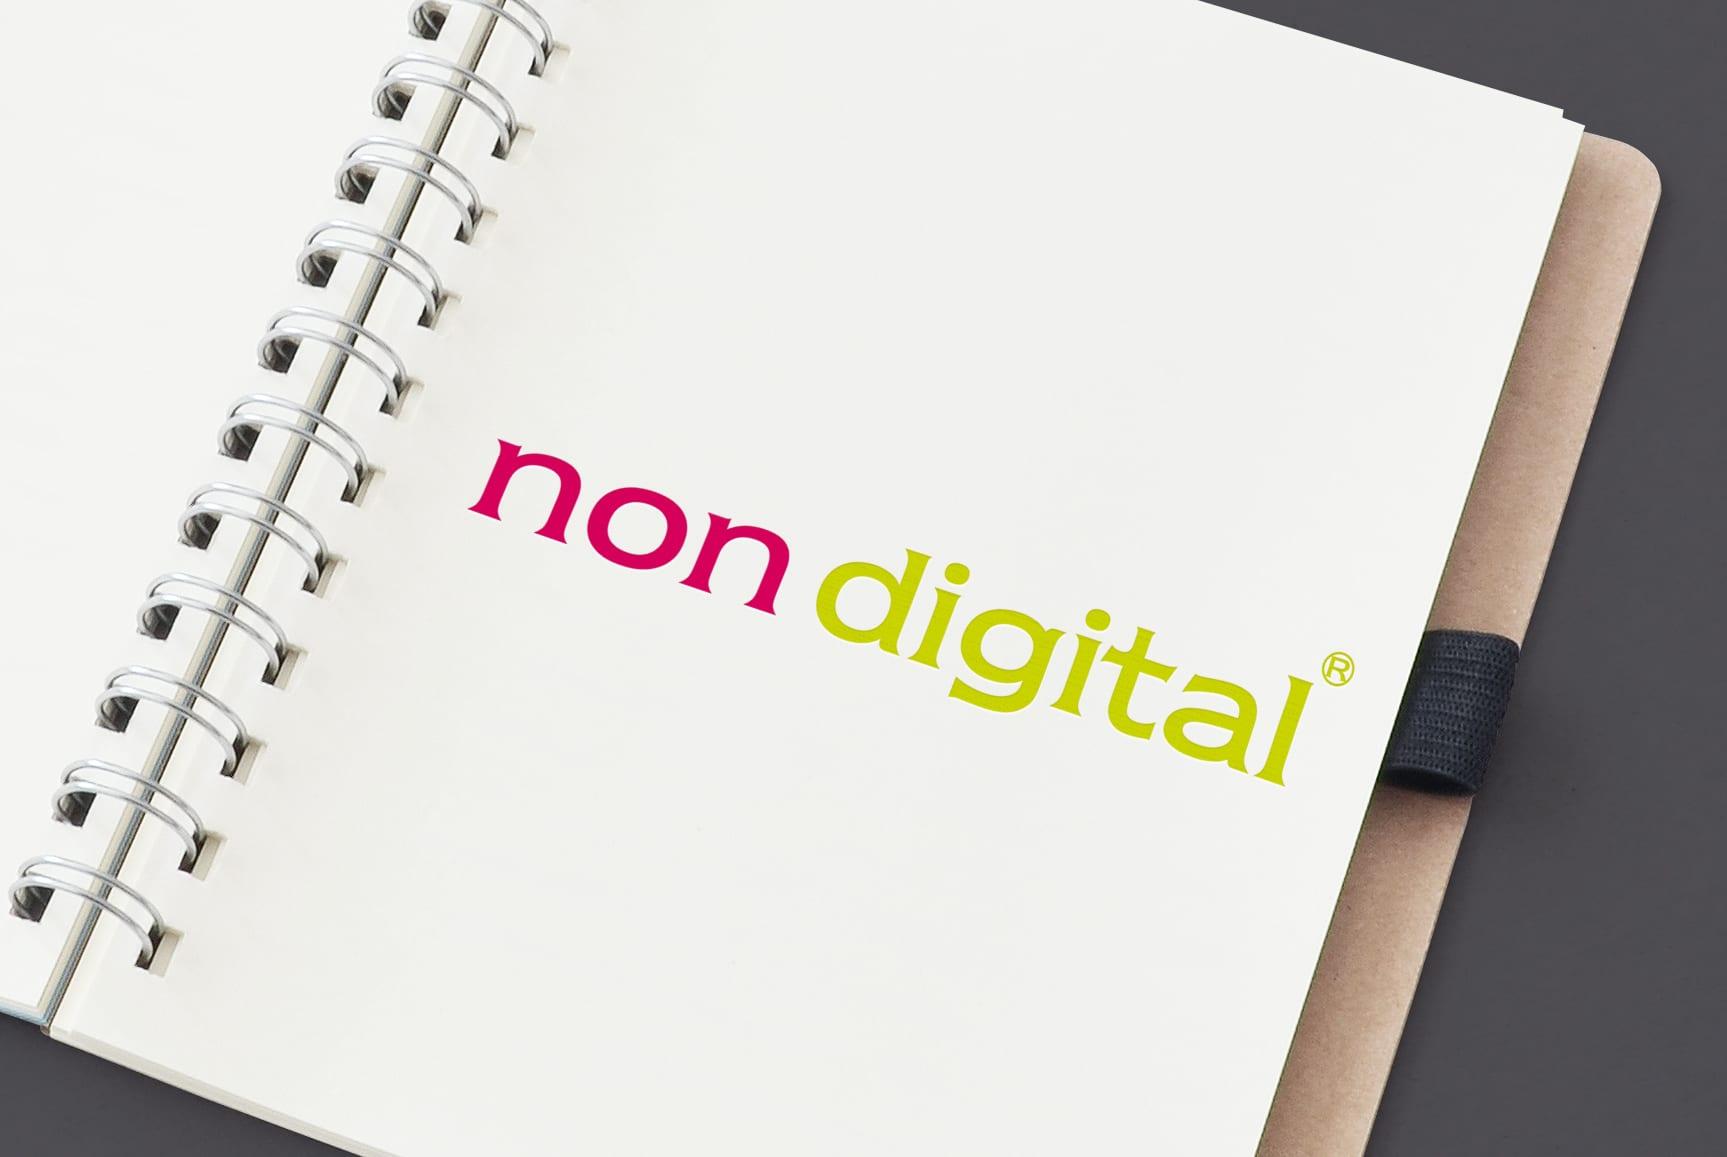 Identidade corporativa Non Digital - Arts and Crafts